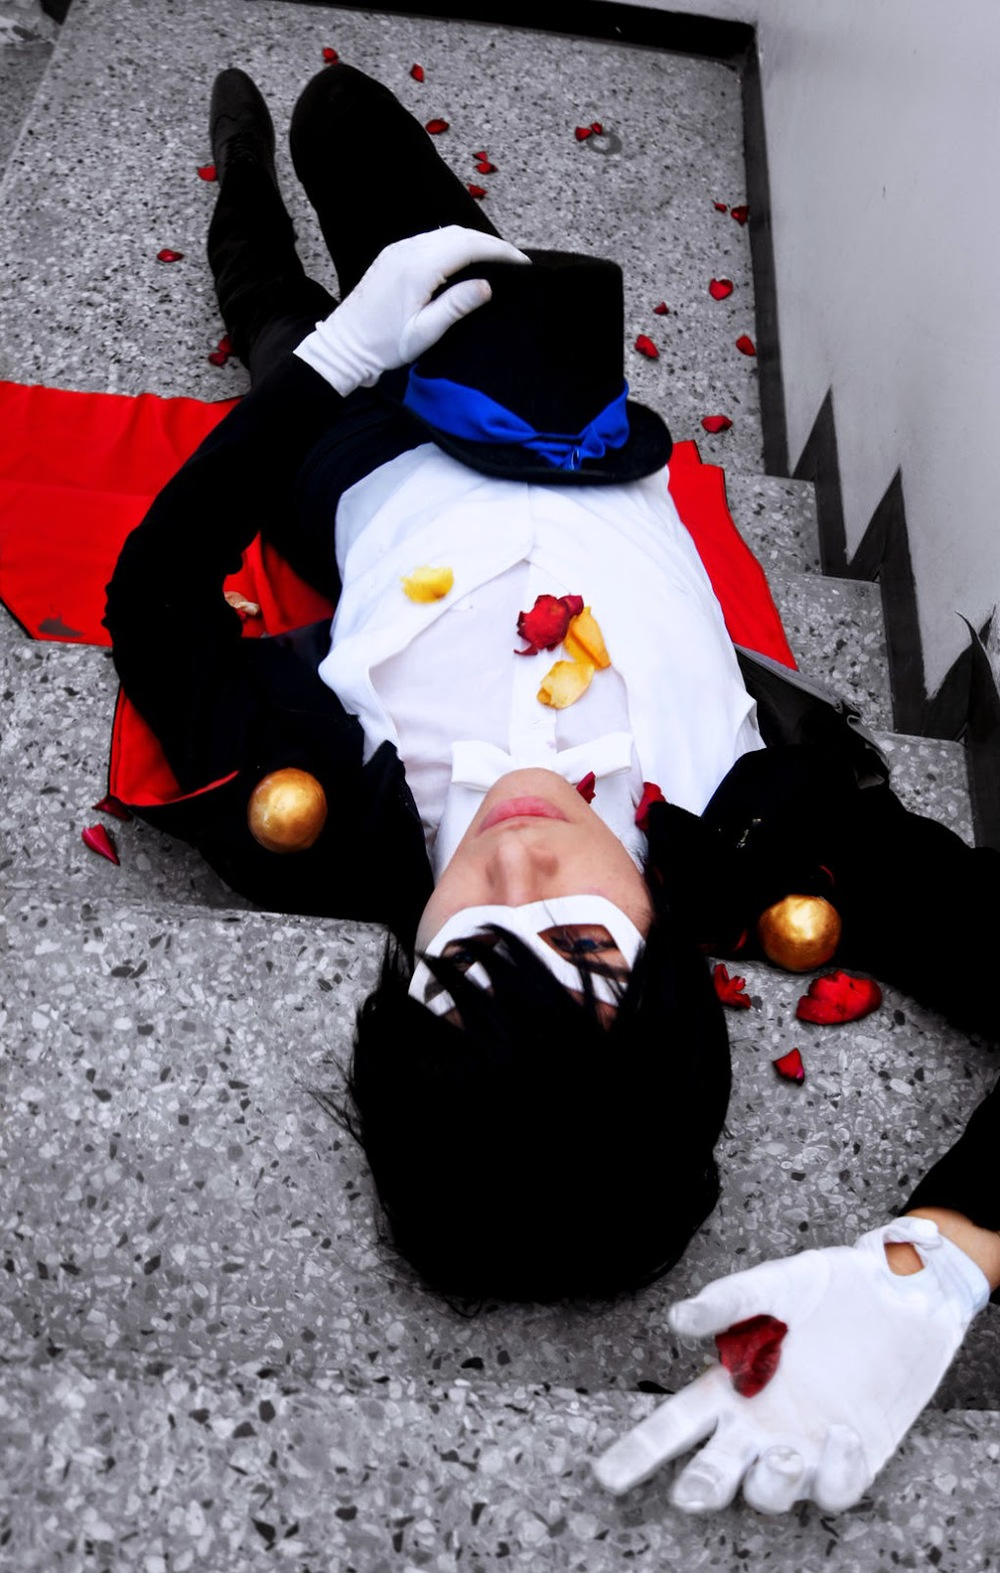 tuxedo_mask_cosplay_i_by_jhonkunagm-d5yxgr2.jpg